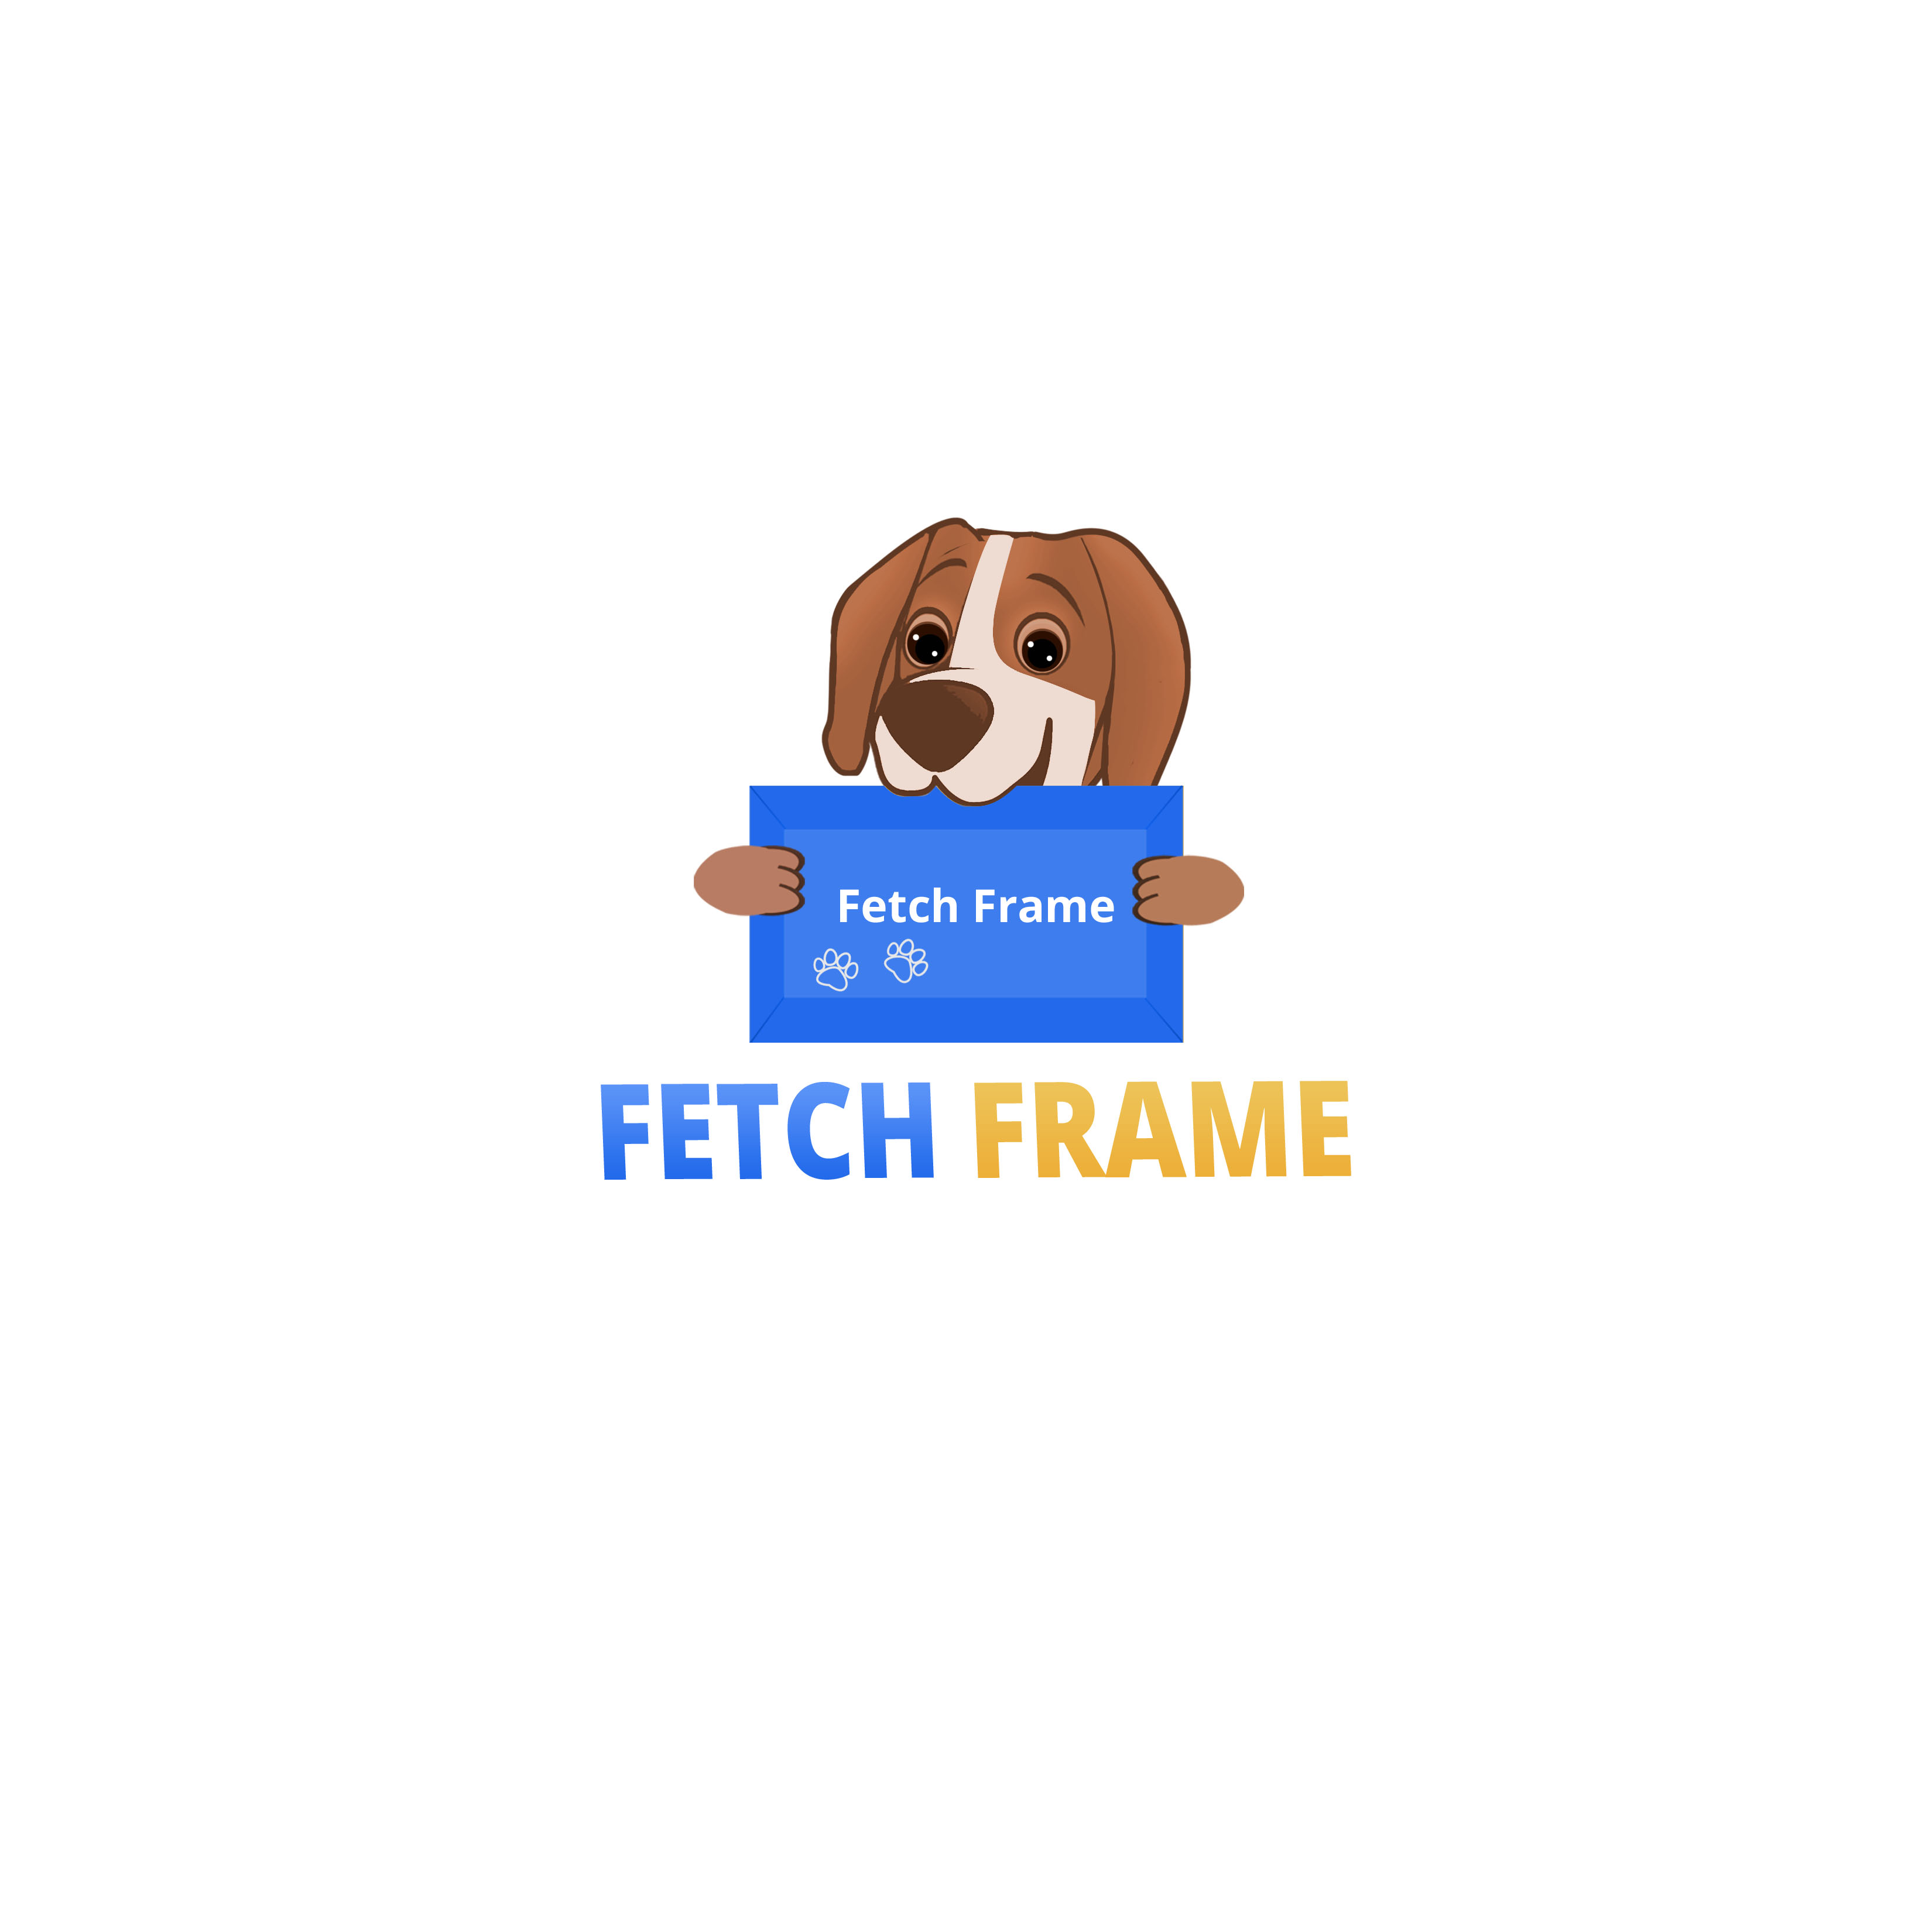 Logo Design by Allan Esclamado - Entry No. 16 in the Logo Design Contest New Logo Design for FetchFrame.